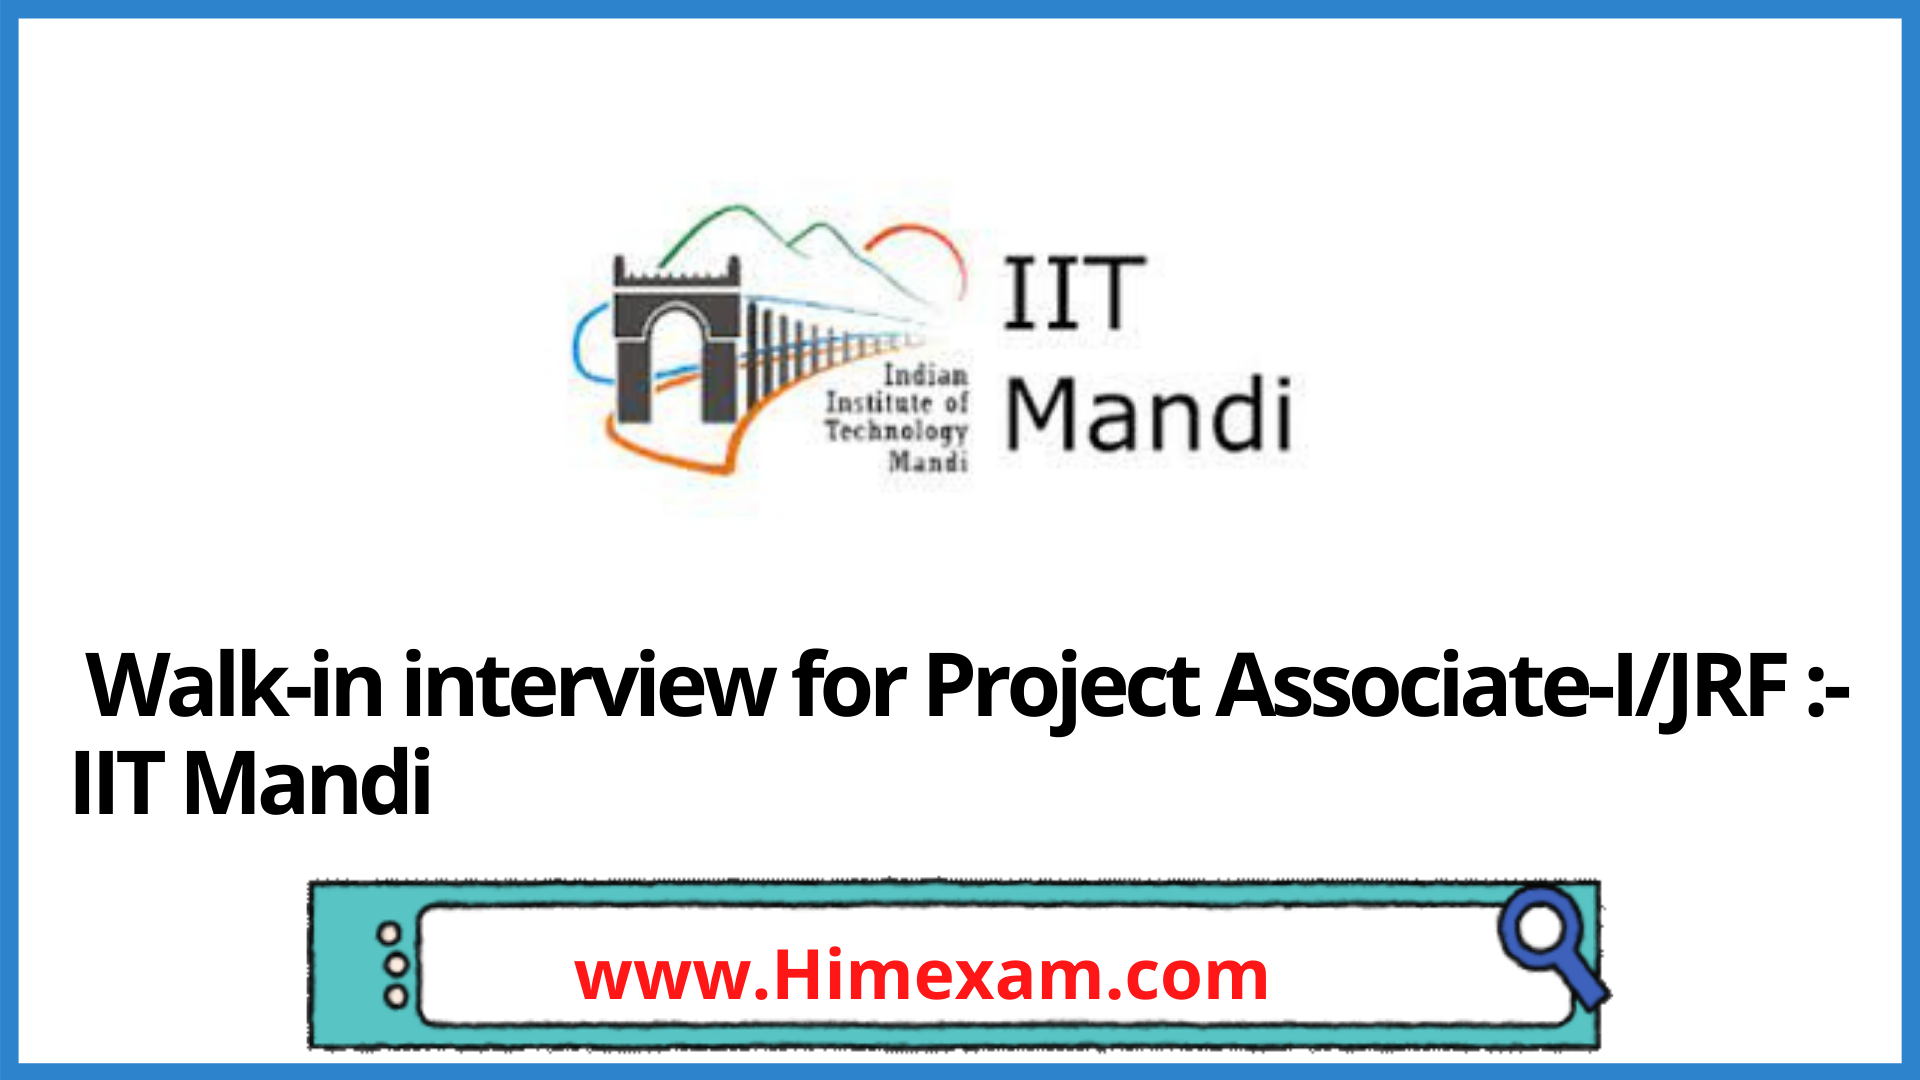 Walk-in interview for Project Associate-I/JRF :- IIT Mandi